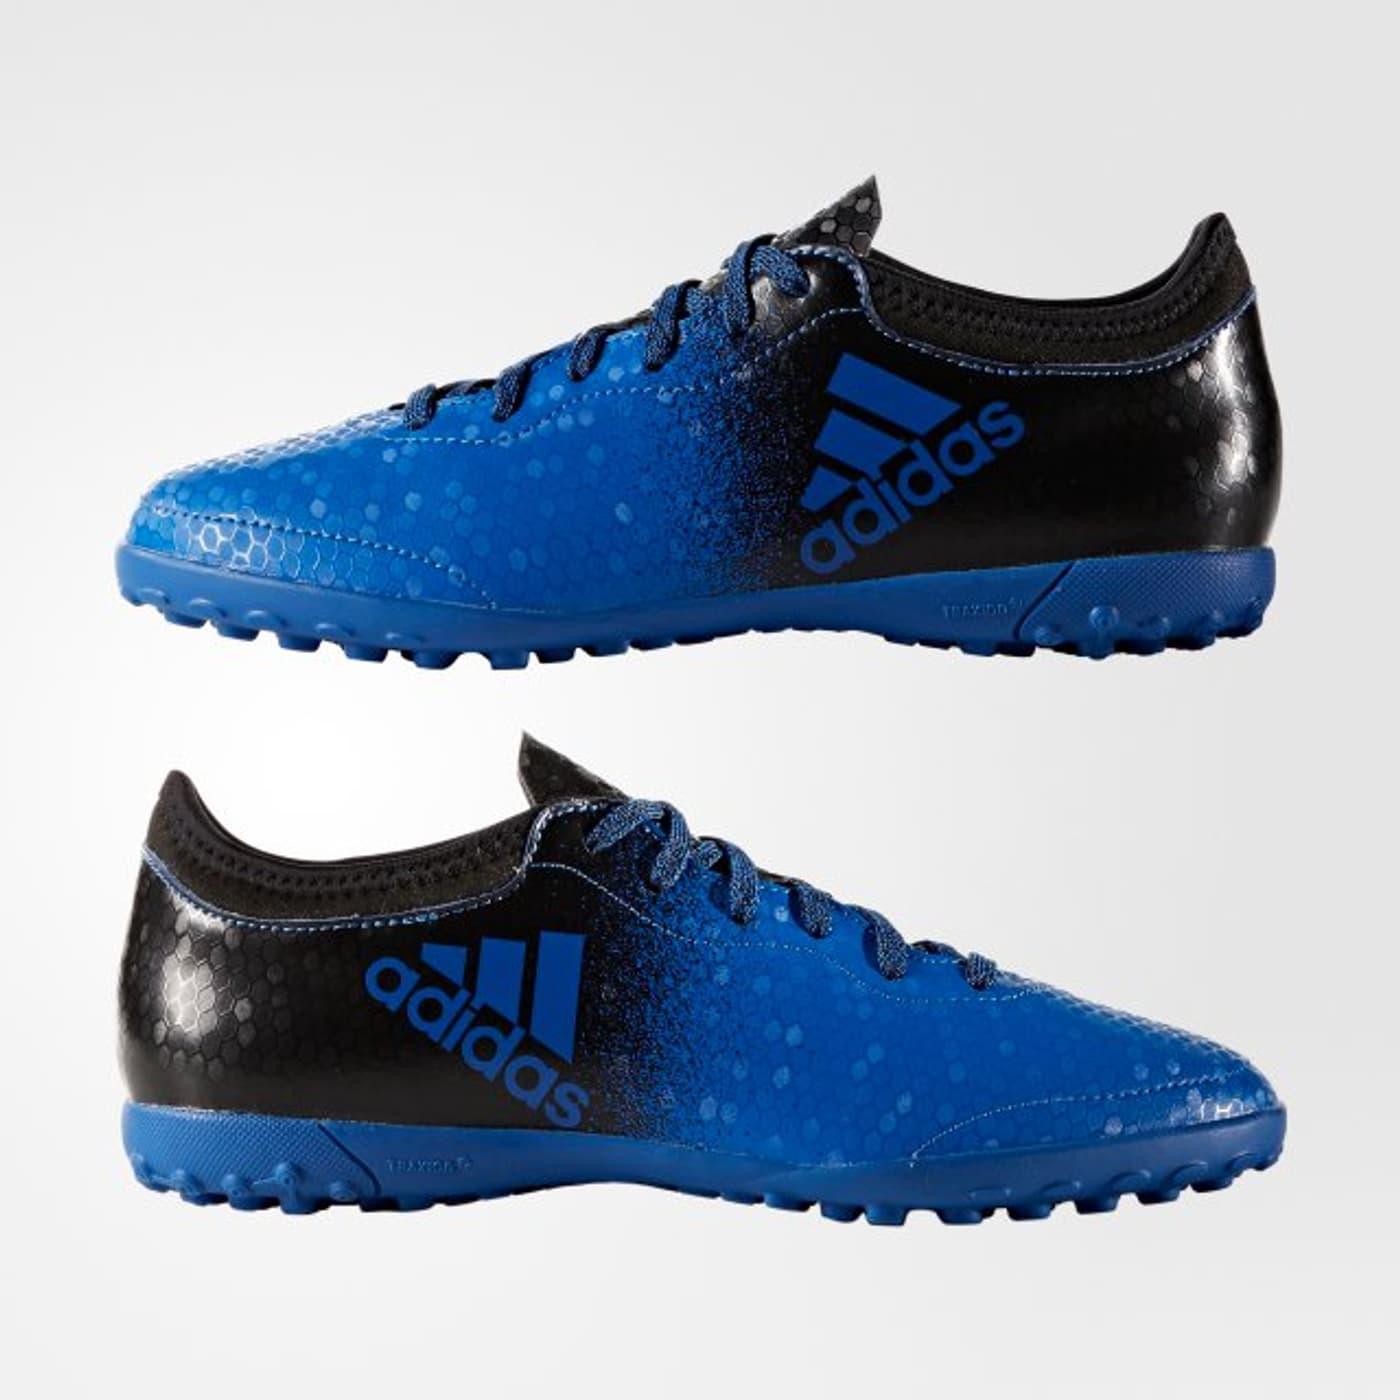 ... Adidas X Tango 16.3 TF Chaussures de football pour enfant ...